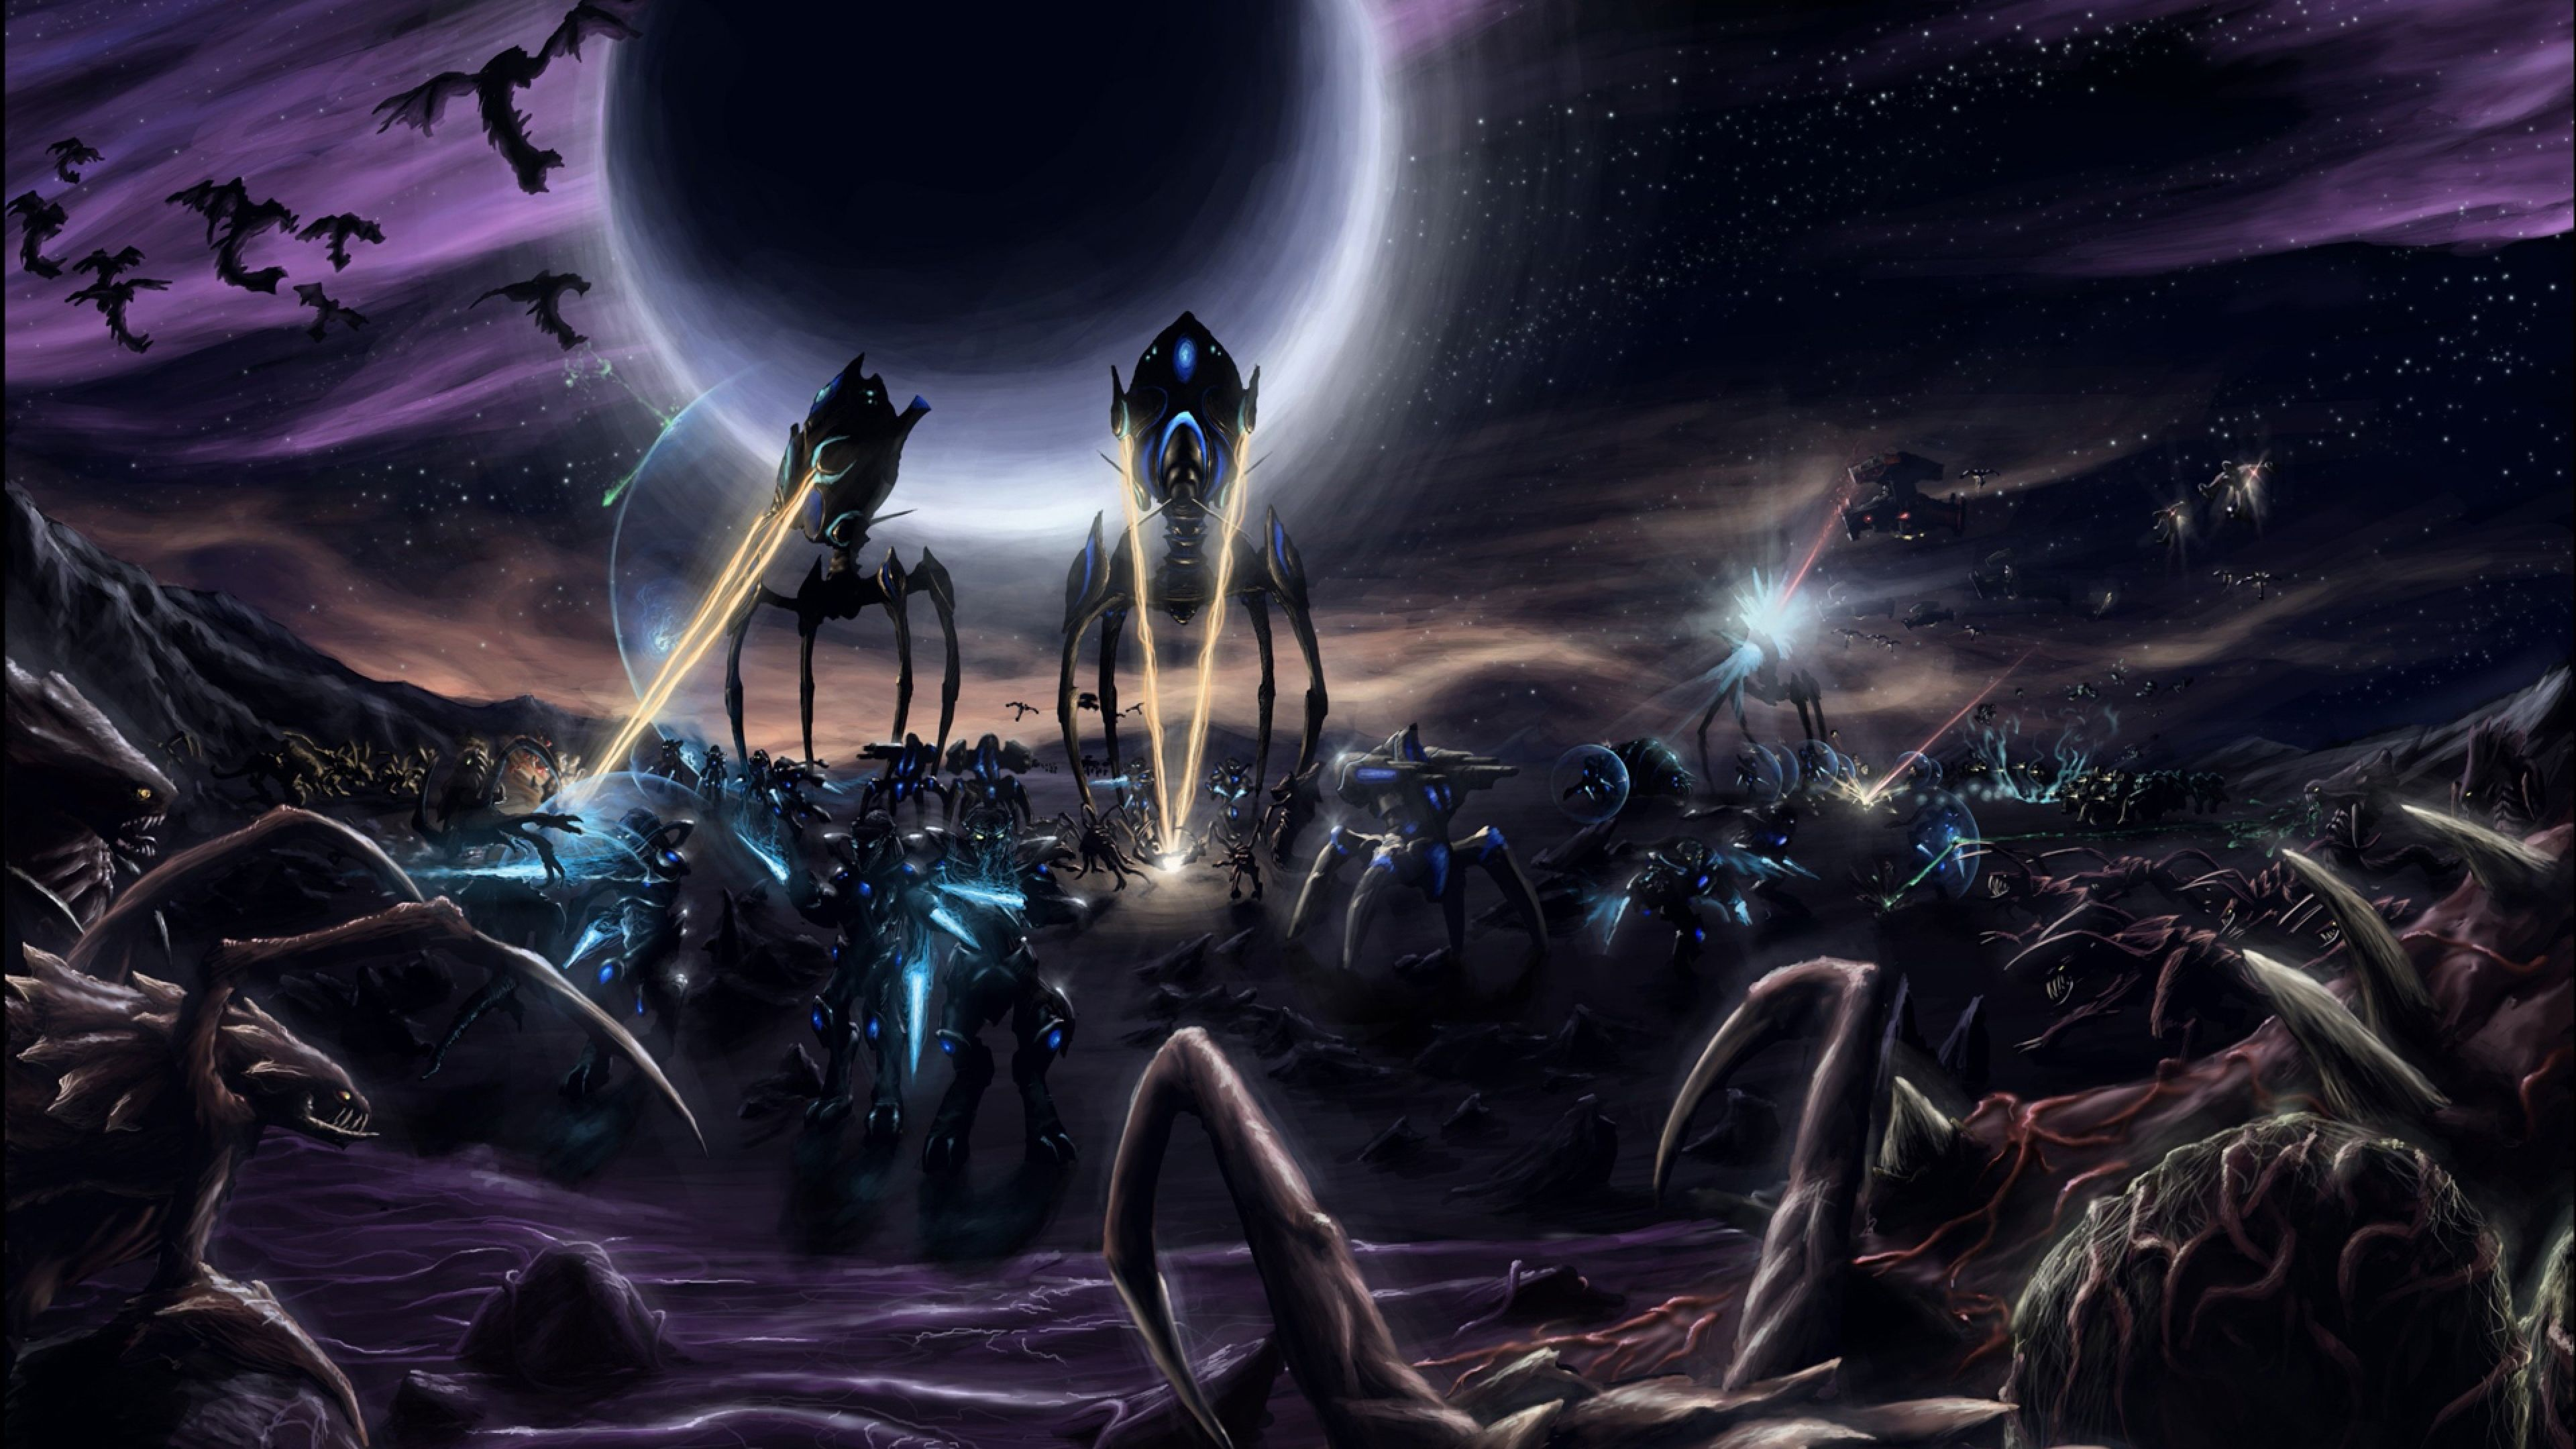 4k Starcraft Wallpapers Top Free 4k Starcraft Backgrounds